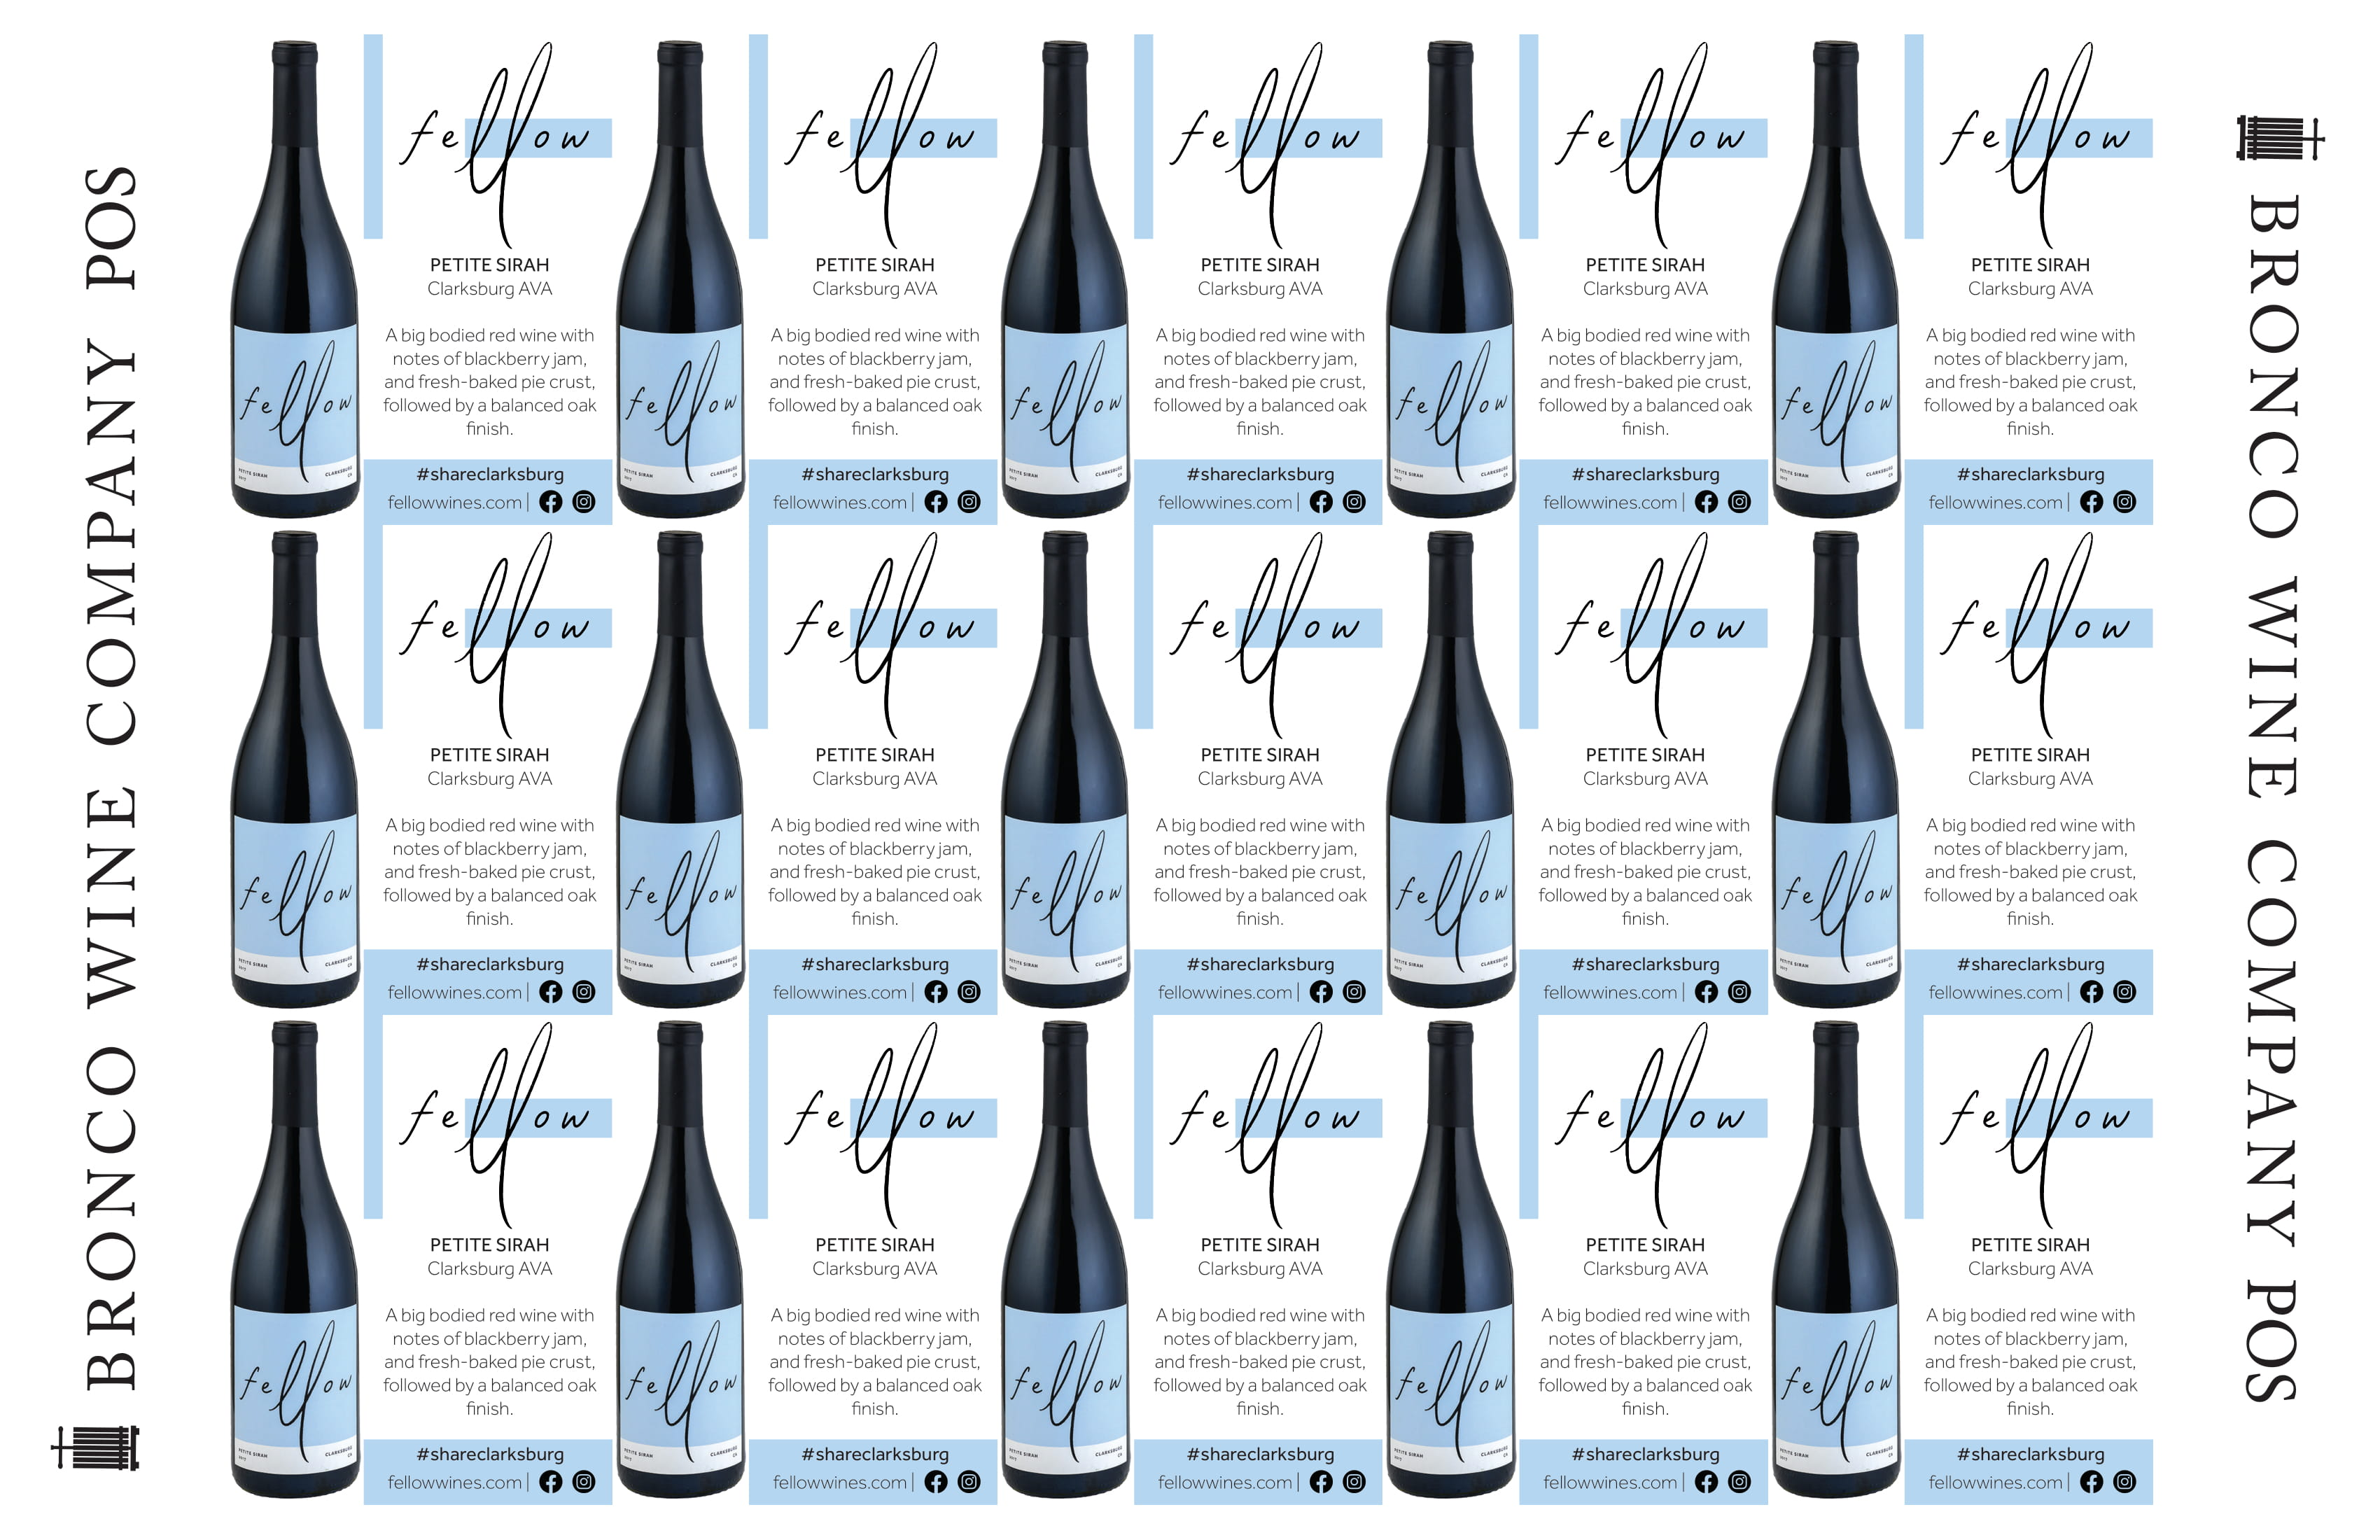 Fellow Wines Petite Sirah Shelf Talker